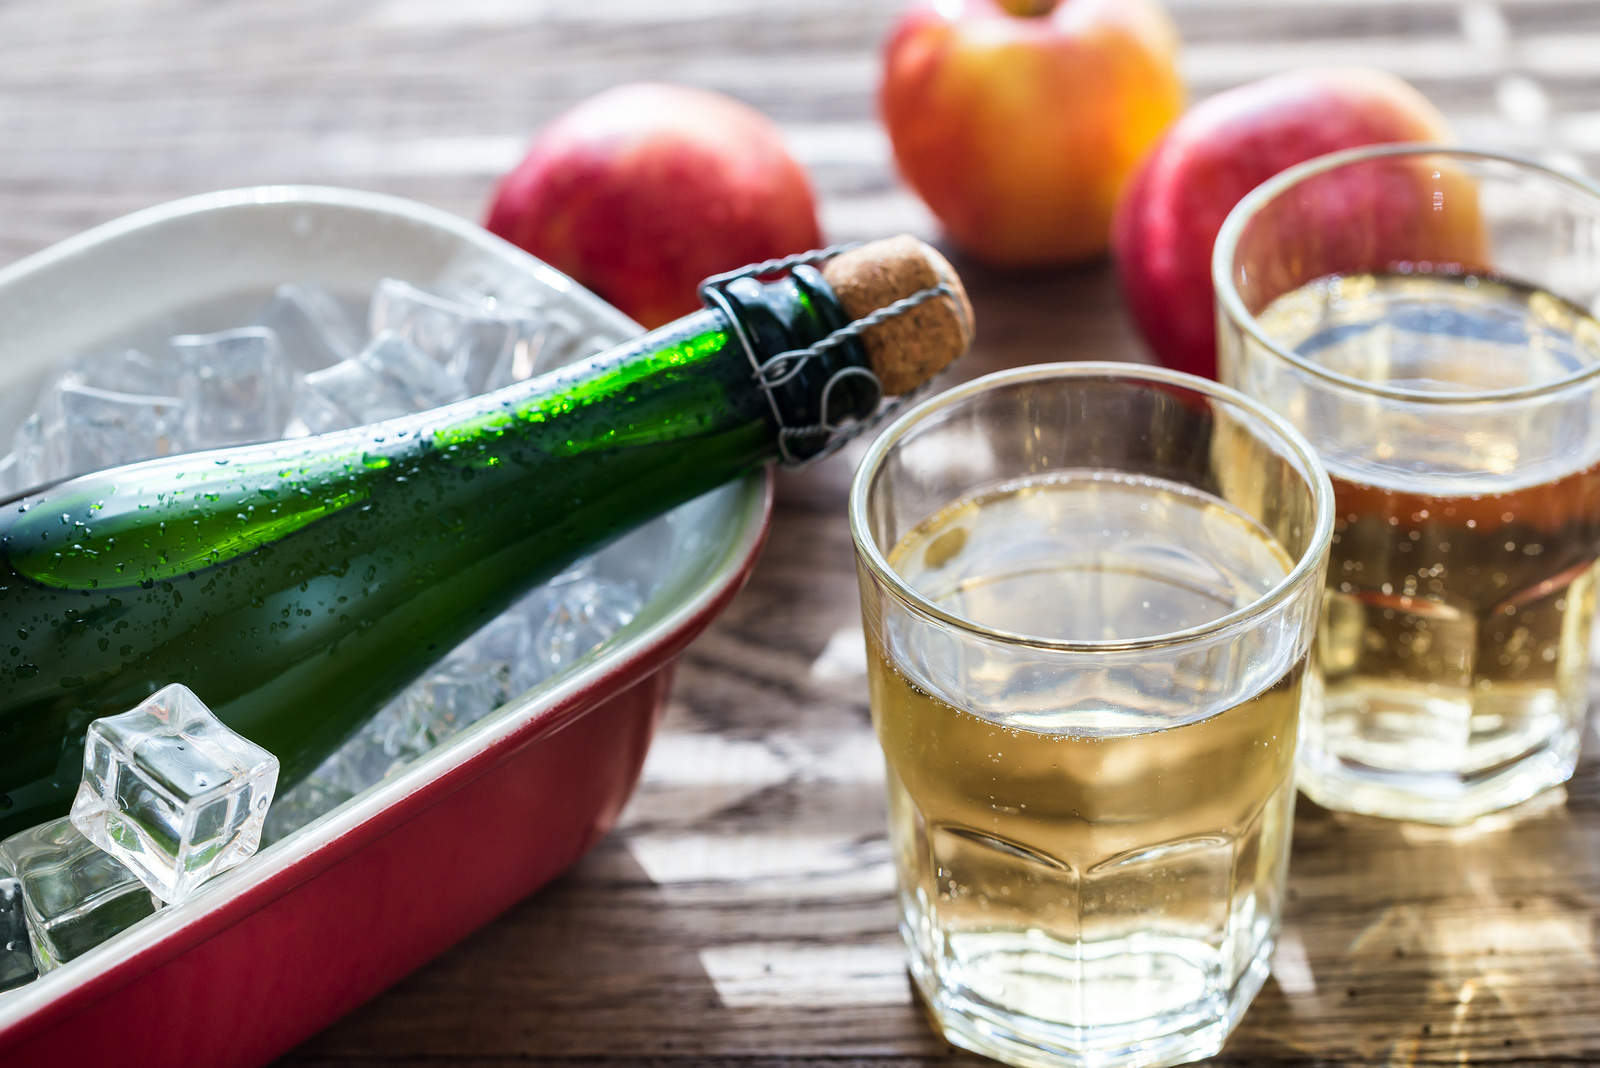 Craft Cider Production